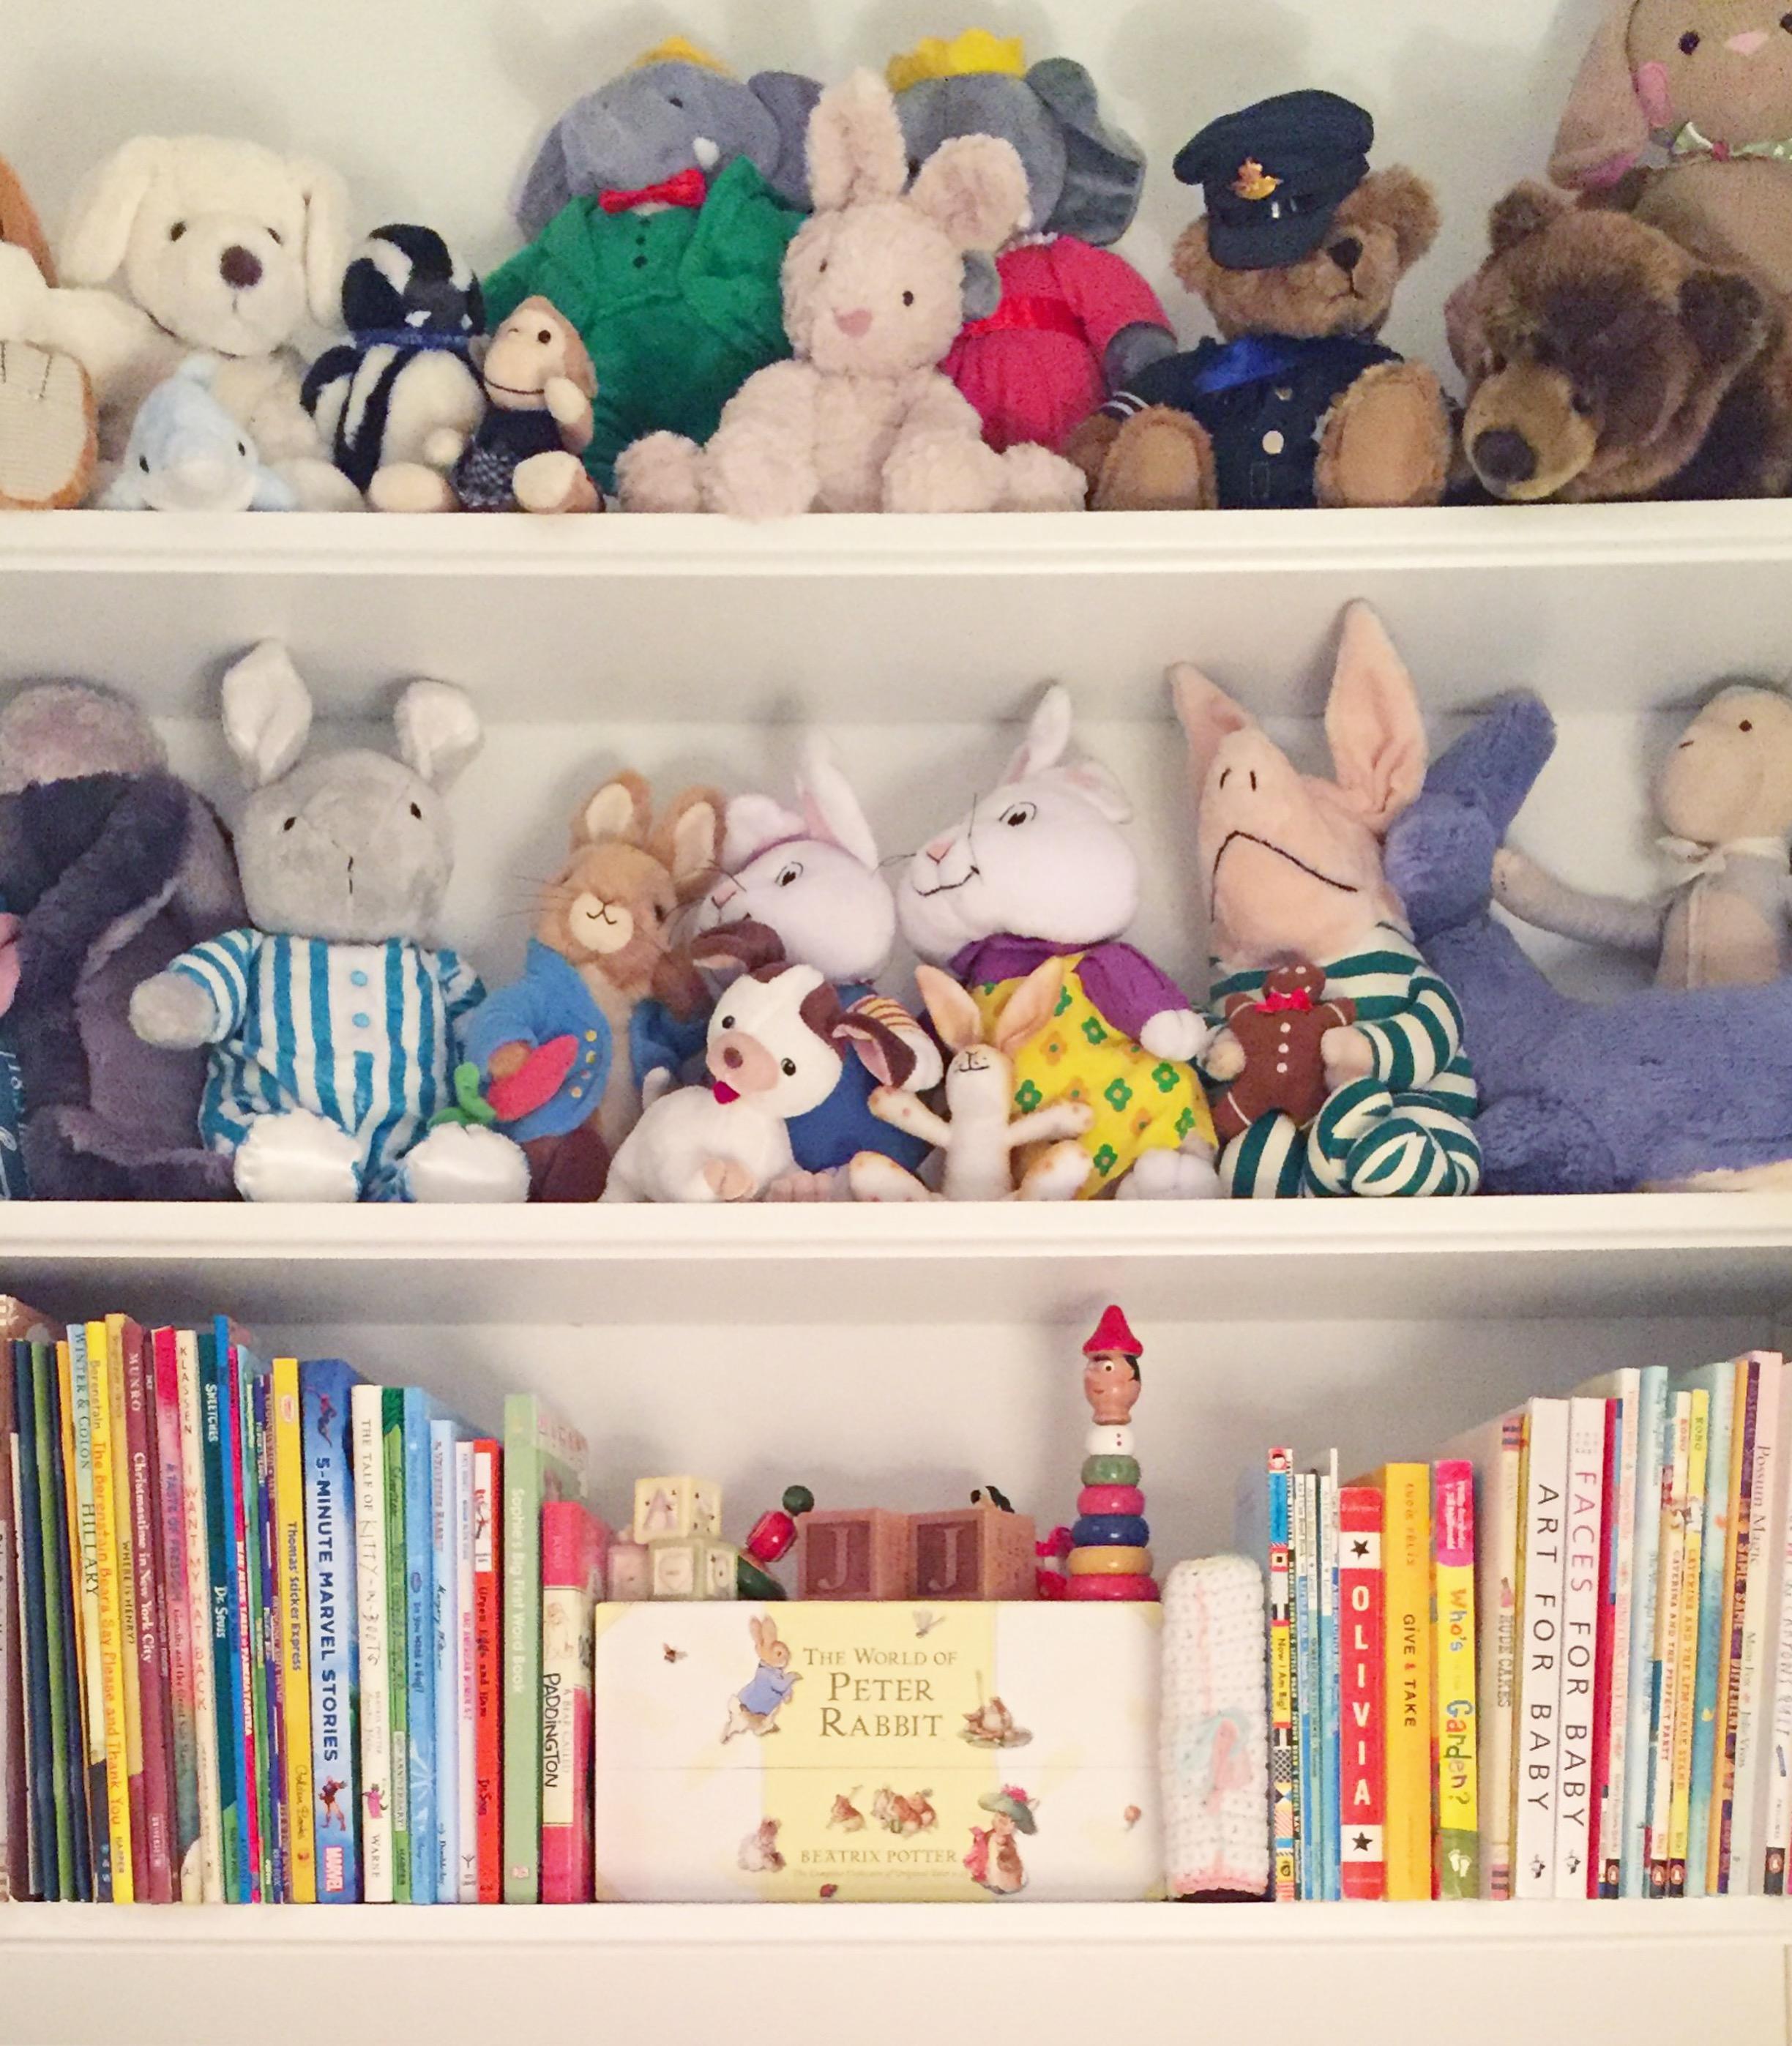 Henry & Higby_Organized Bookcase.JPG